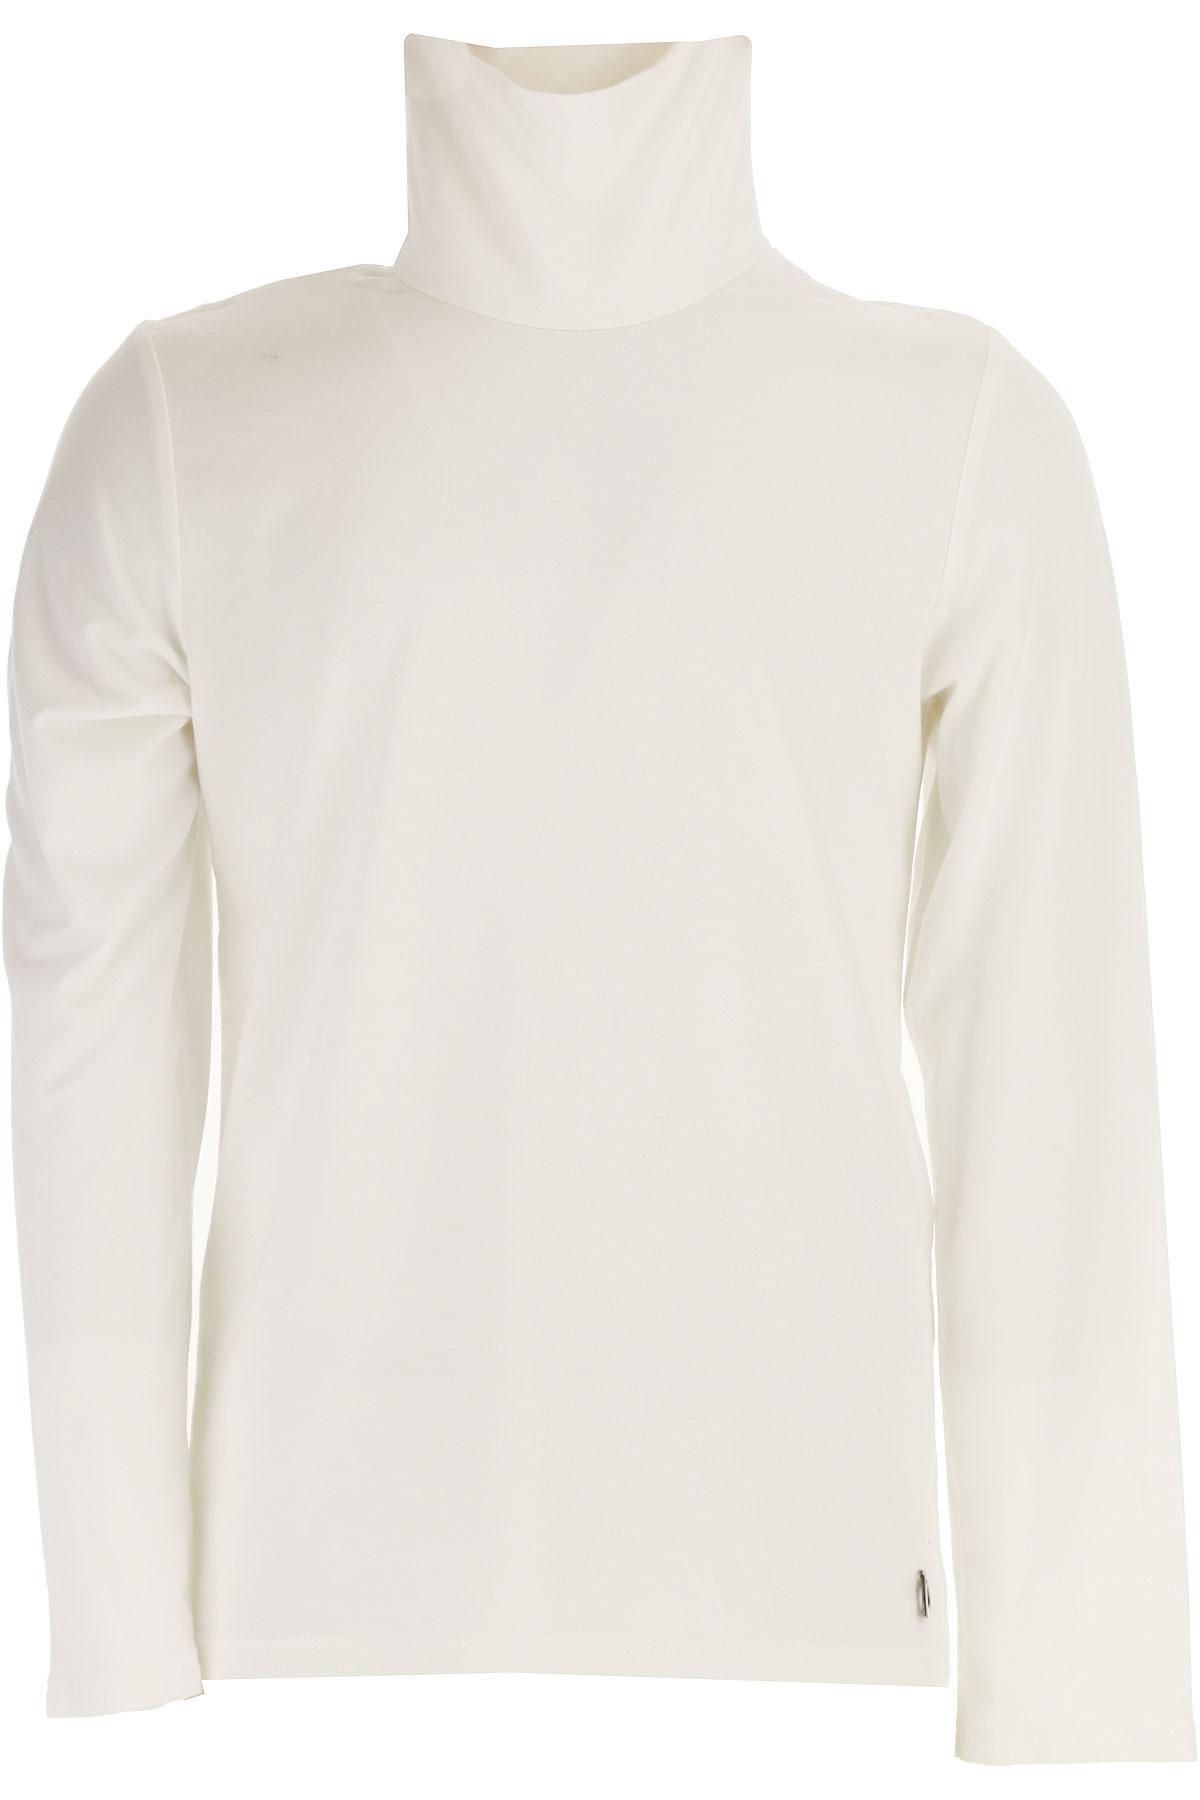 Dixie Kids Sweaters for Girls On Sale, White, viscosa, 2019, L M XL XXL